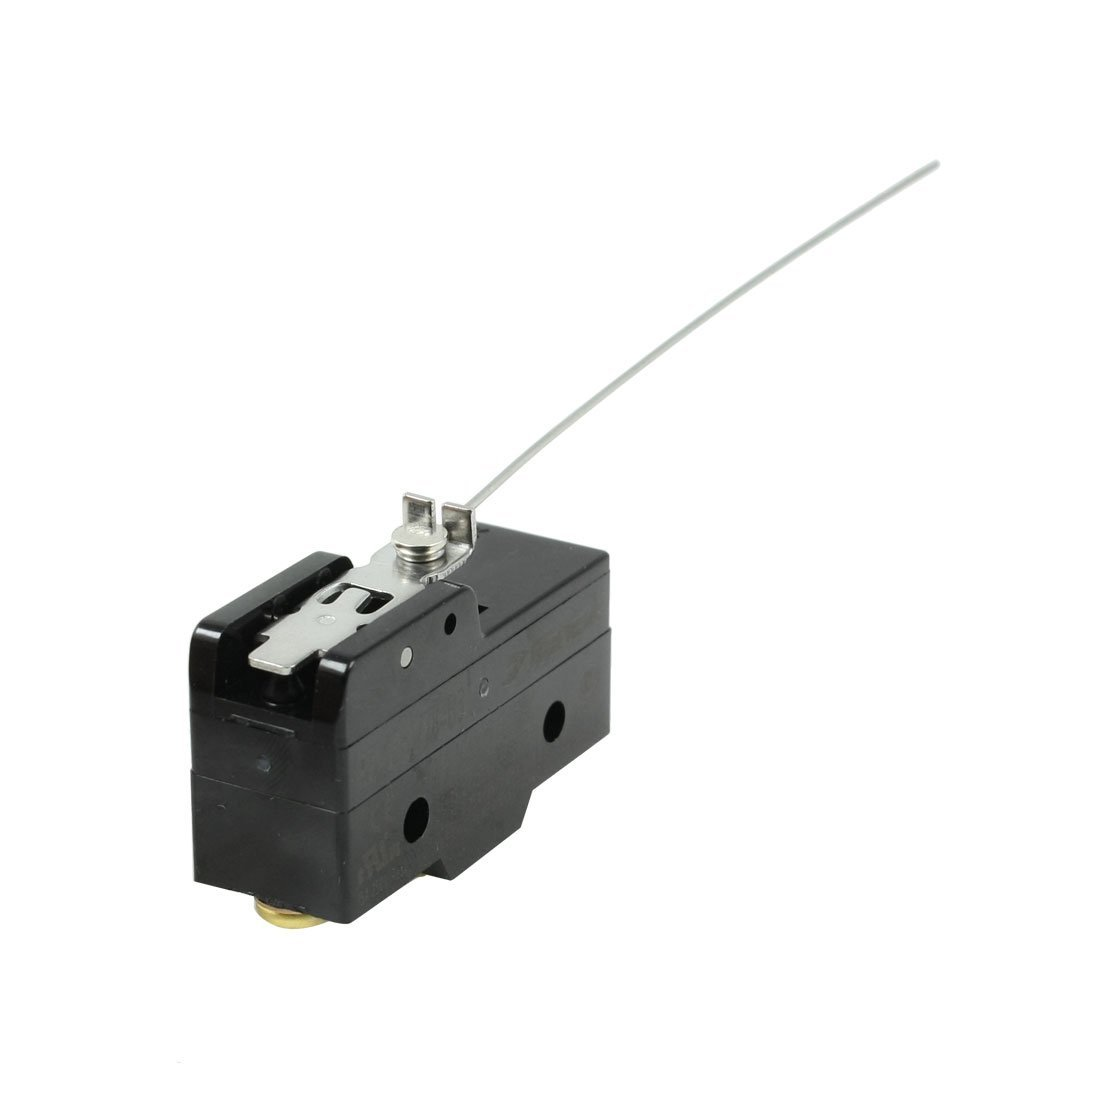 Sonda PRT de respuesta r/ápida 100 Ohm, 3,2 mm Fluke 5622-32-B